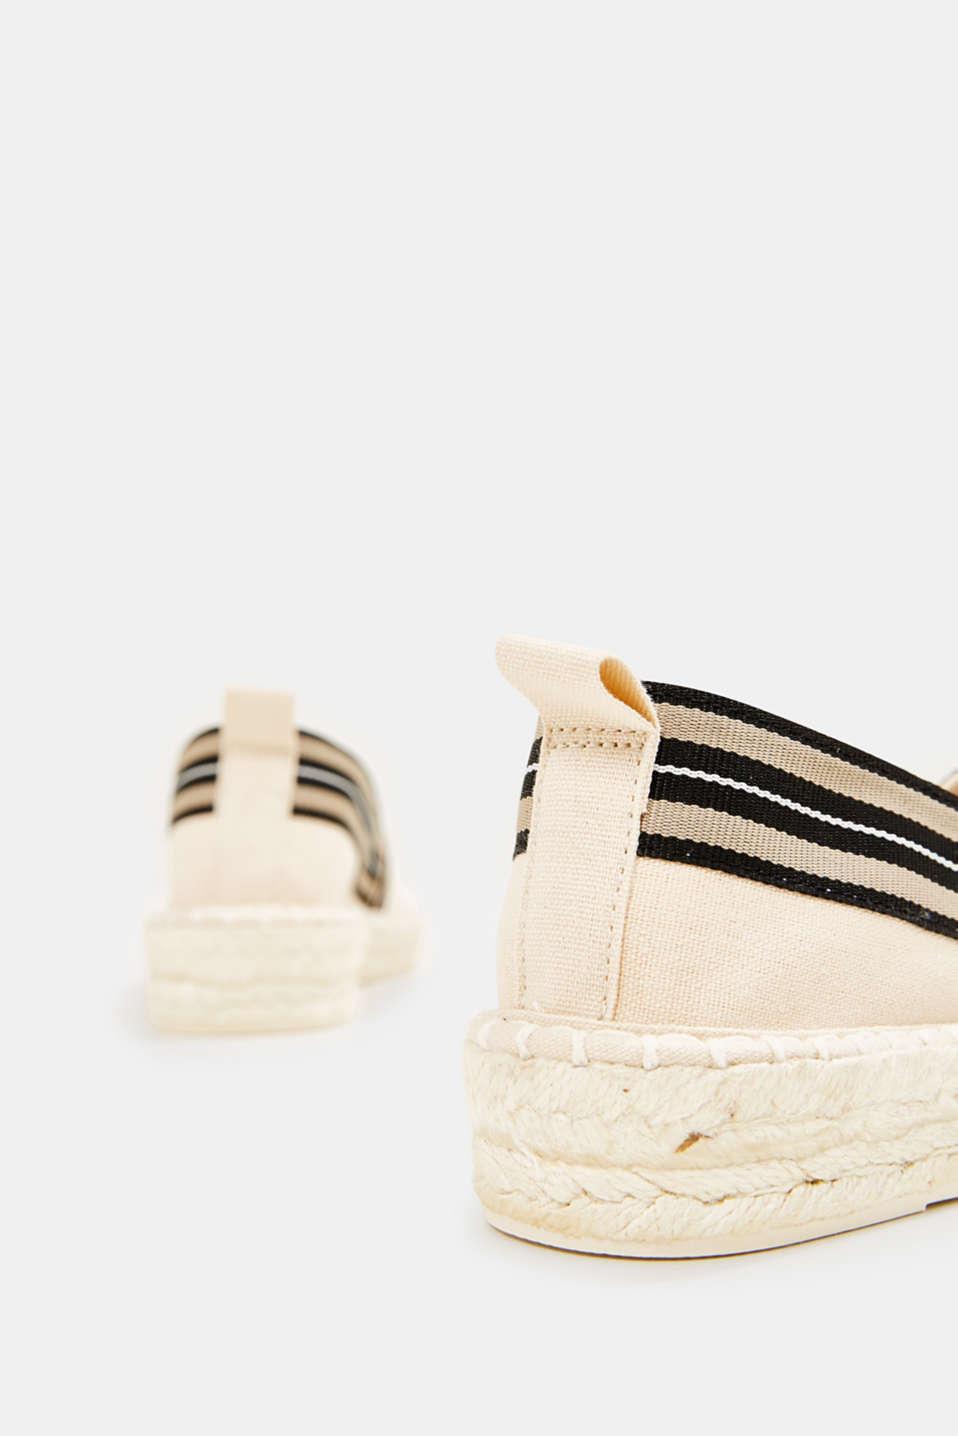 Espadrilles with striped details, CREAM BEIGE, detail image number 4